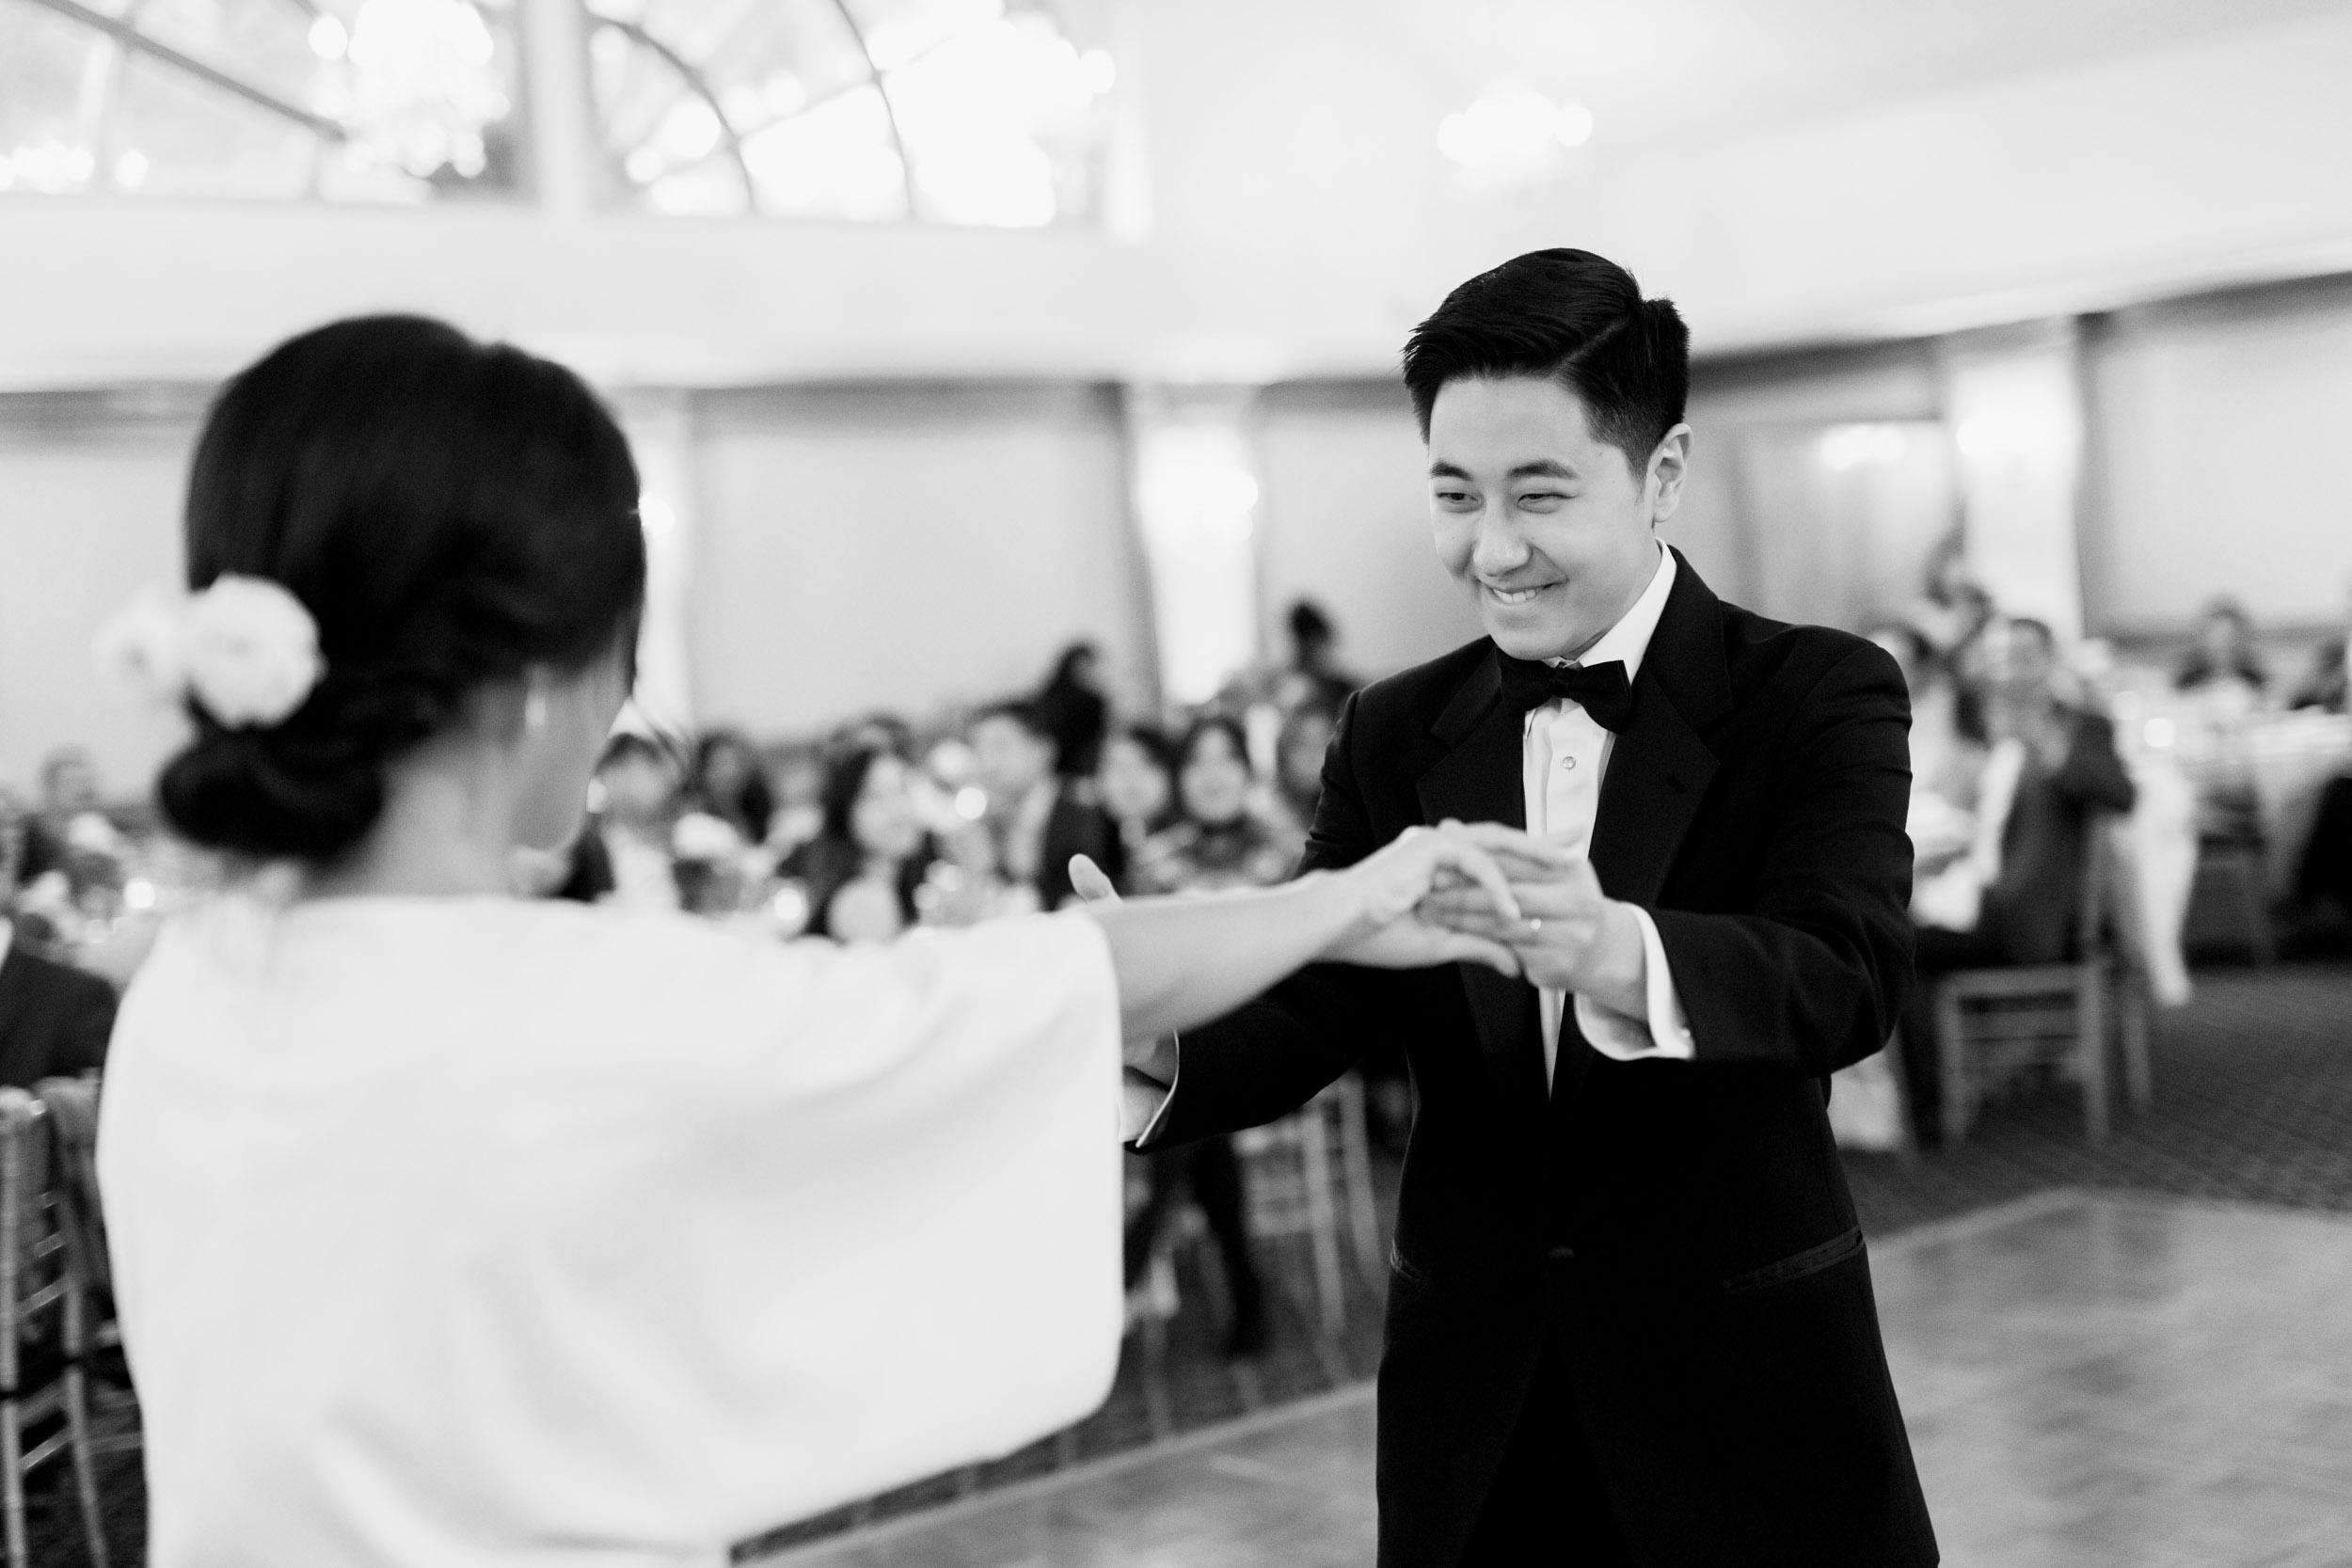 jean-arnold-wedding-0034.jpg